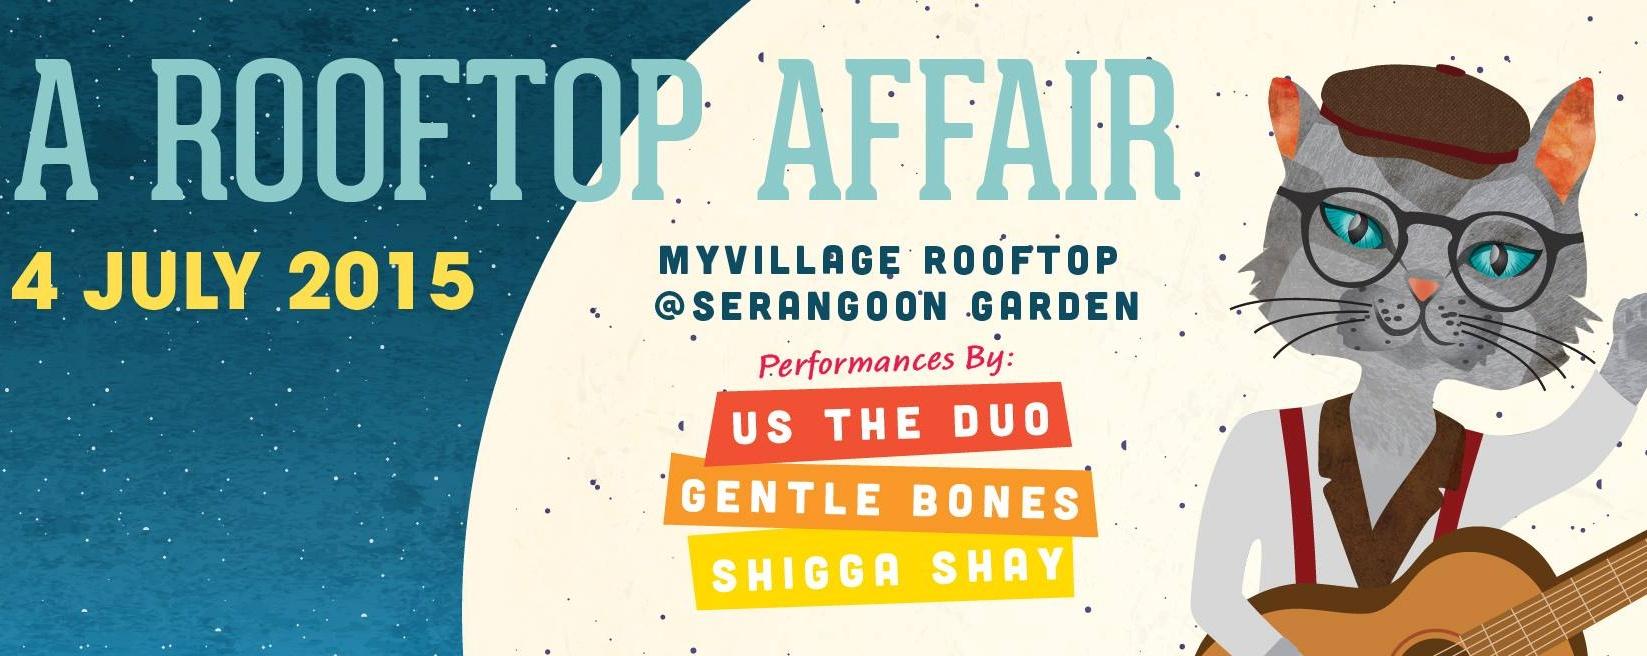 A Rooftop Affair